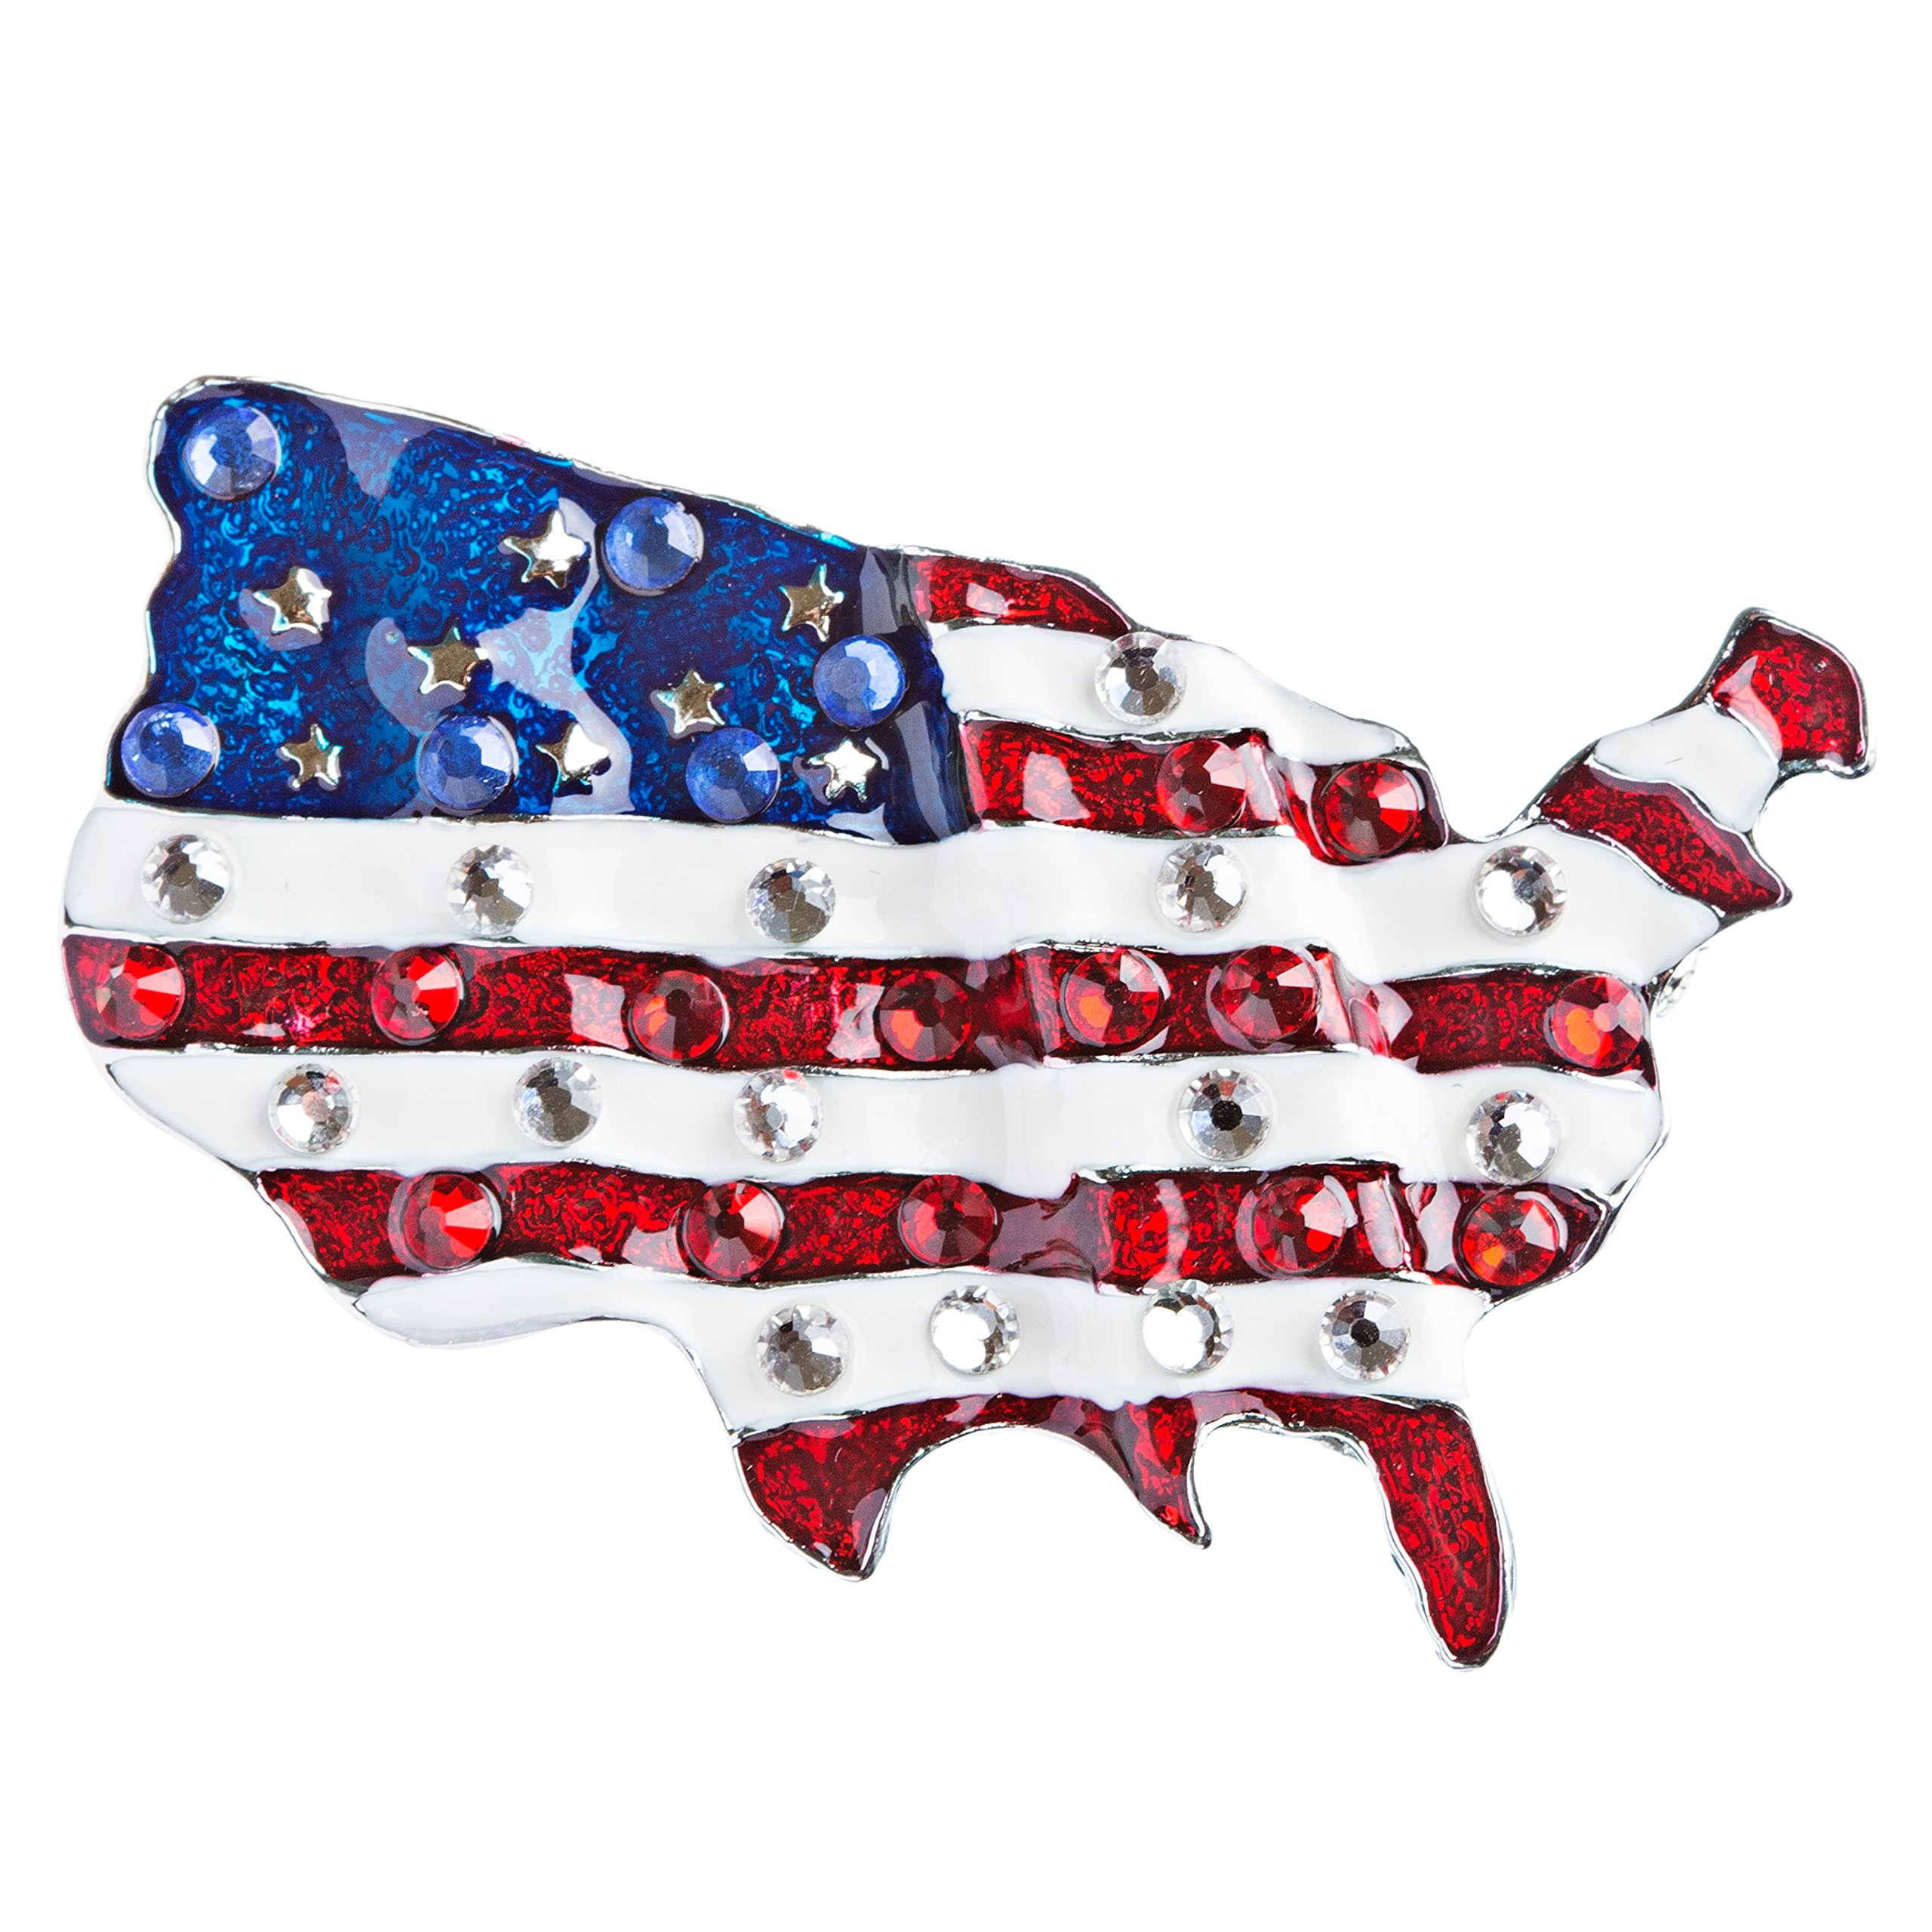 ACCESSORIESFOREVER Patriotic Jewelry Crystal Rhinestone American Flag Charm Brooch Pin BH84 Silver